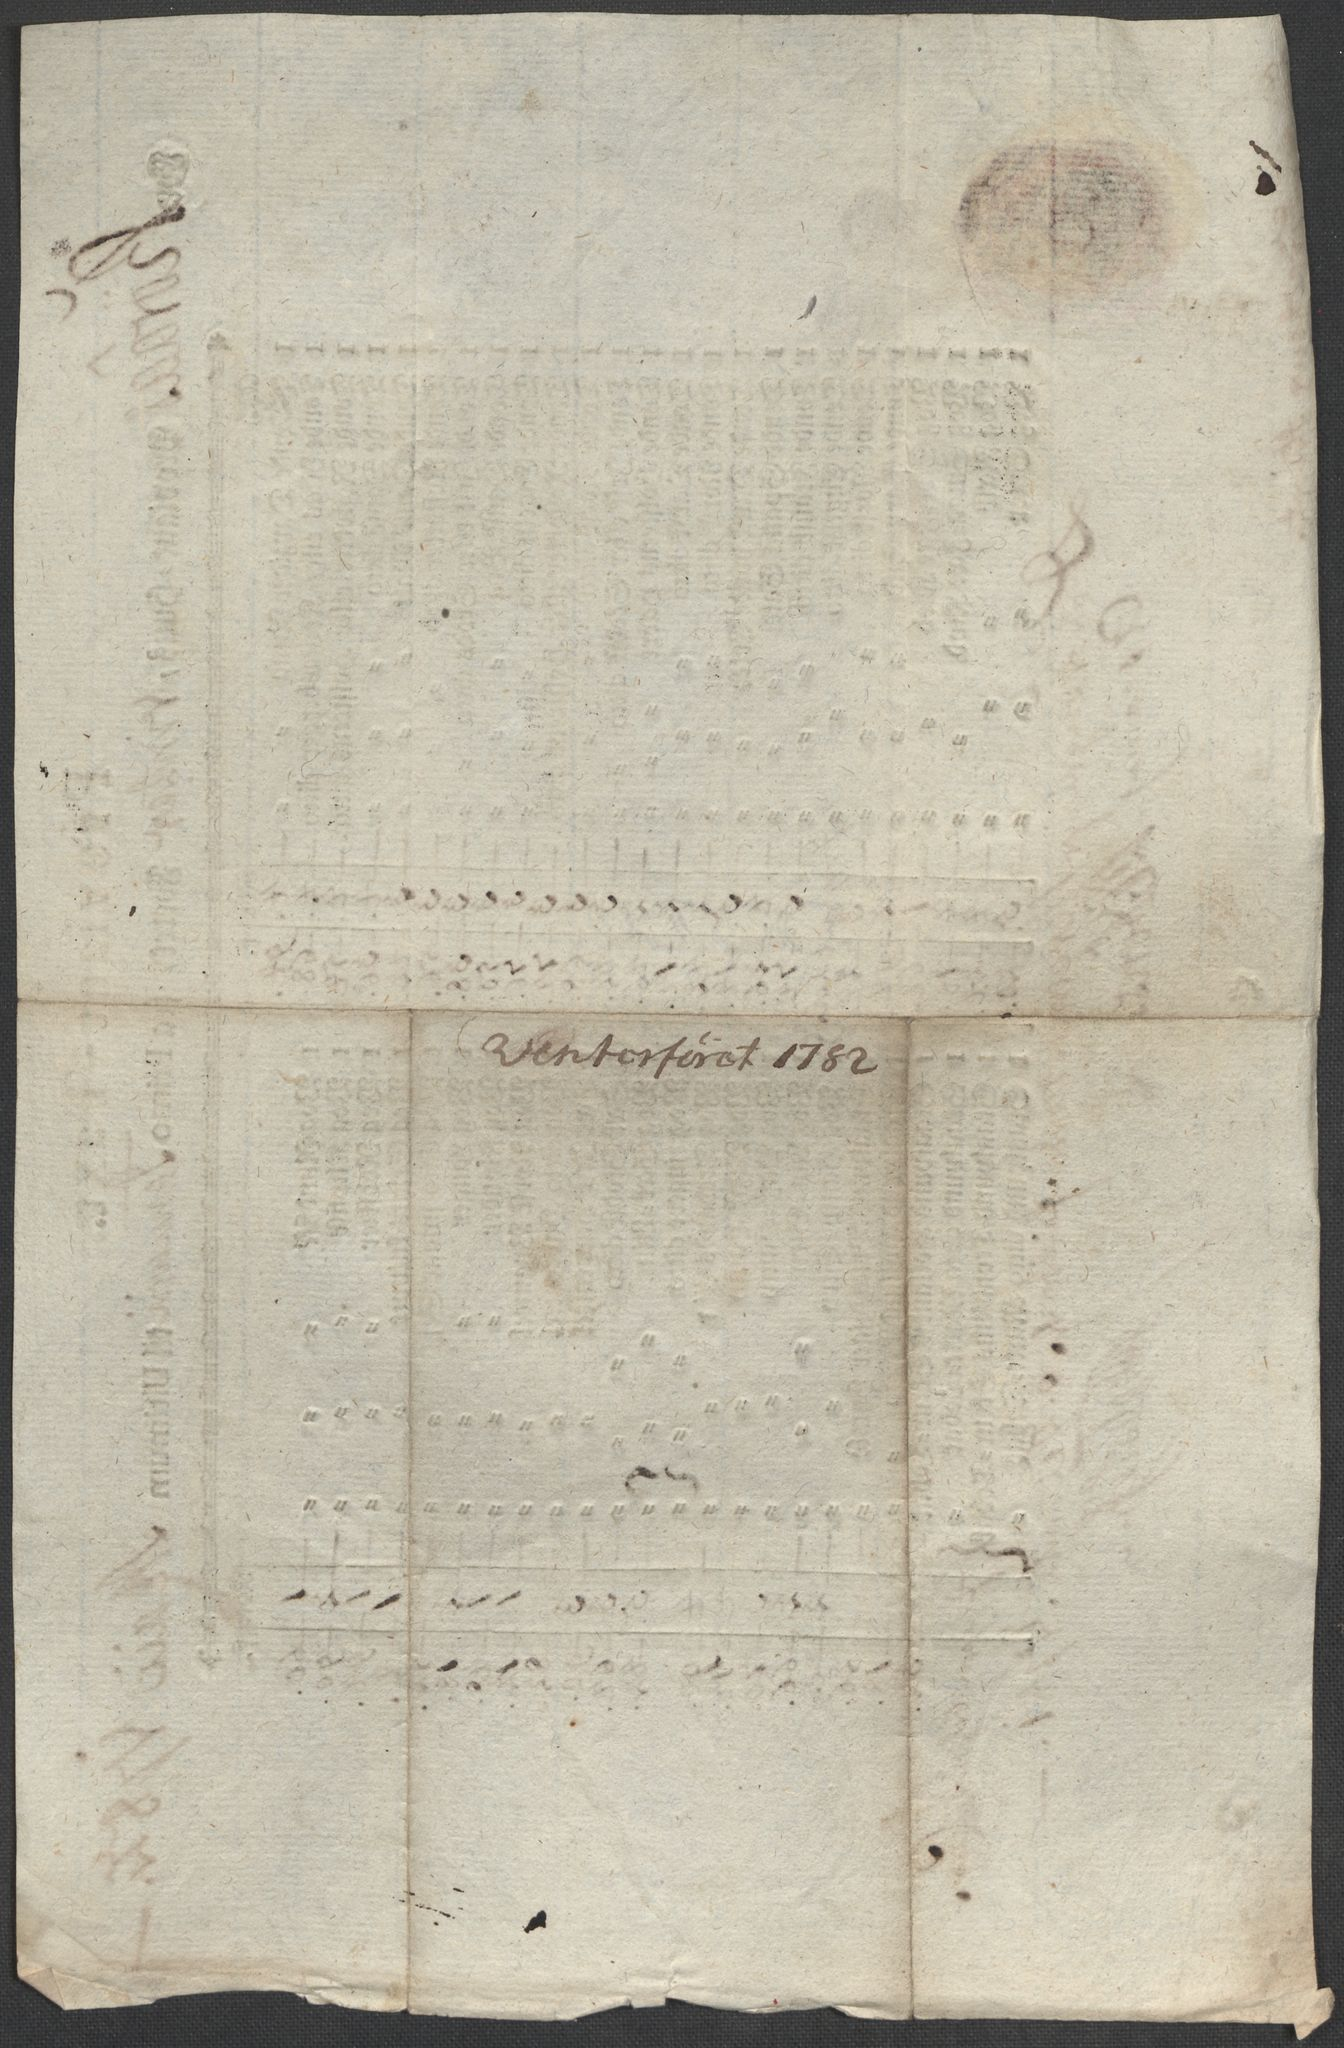 SAT, Røros kobberverk, 12/L0021: 12.20.9 Provianttakster, 1765-1824, p. 71